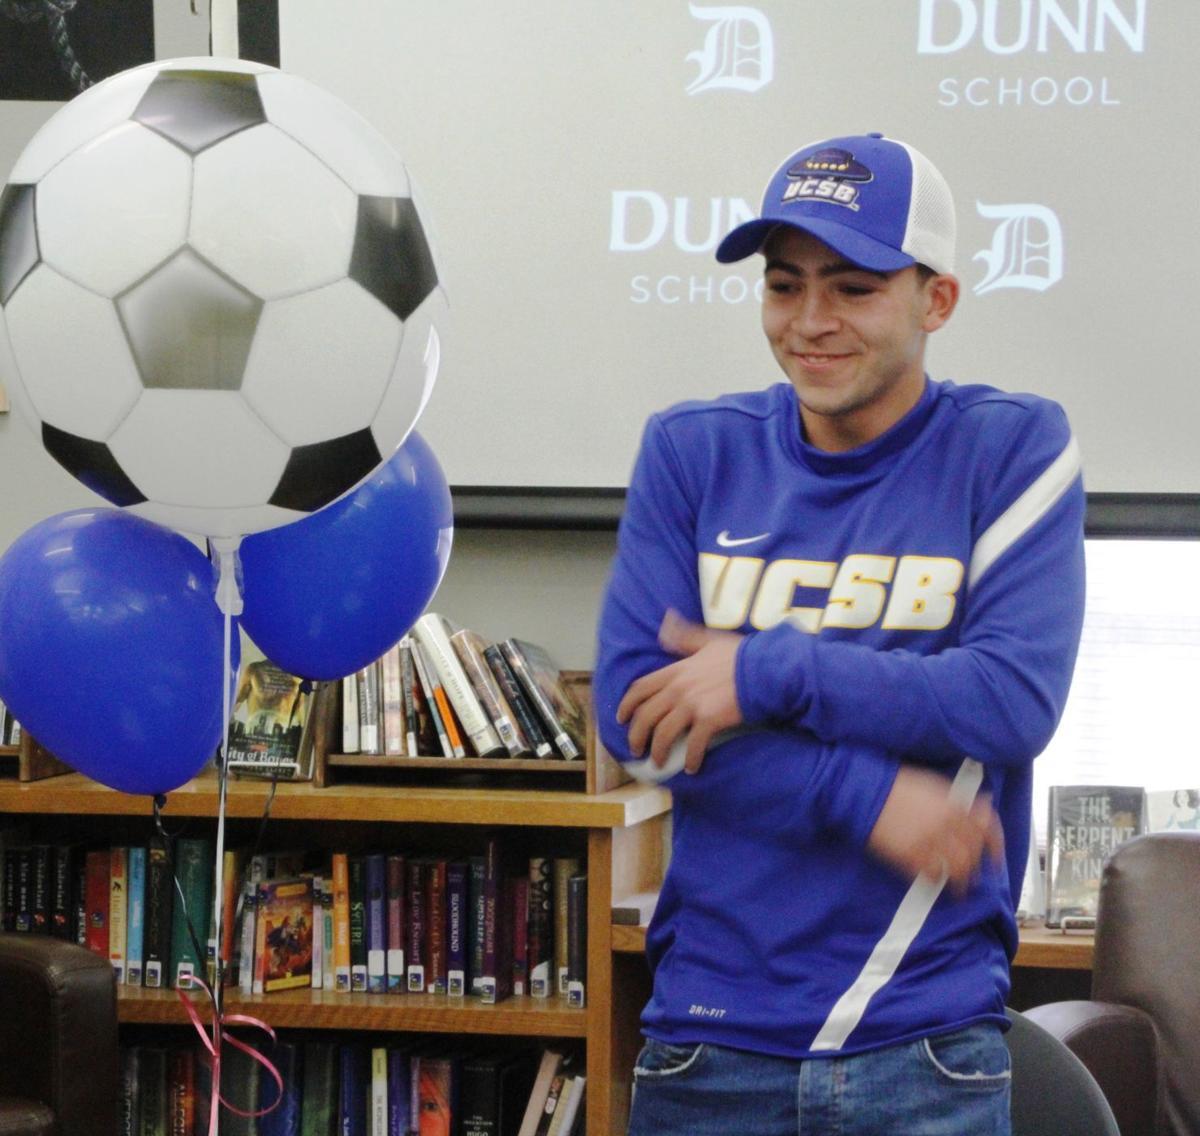 Dunn School's Rodney Michael wins Gatorade Player of the Year award